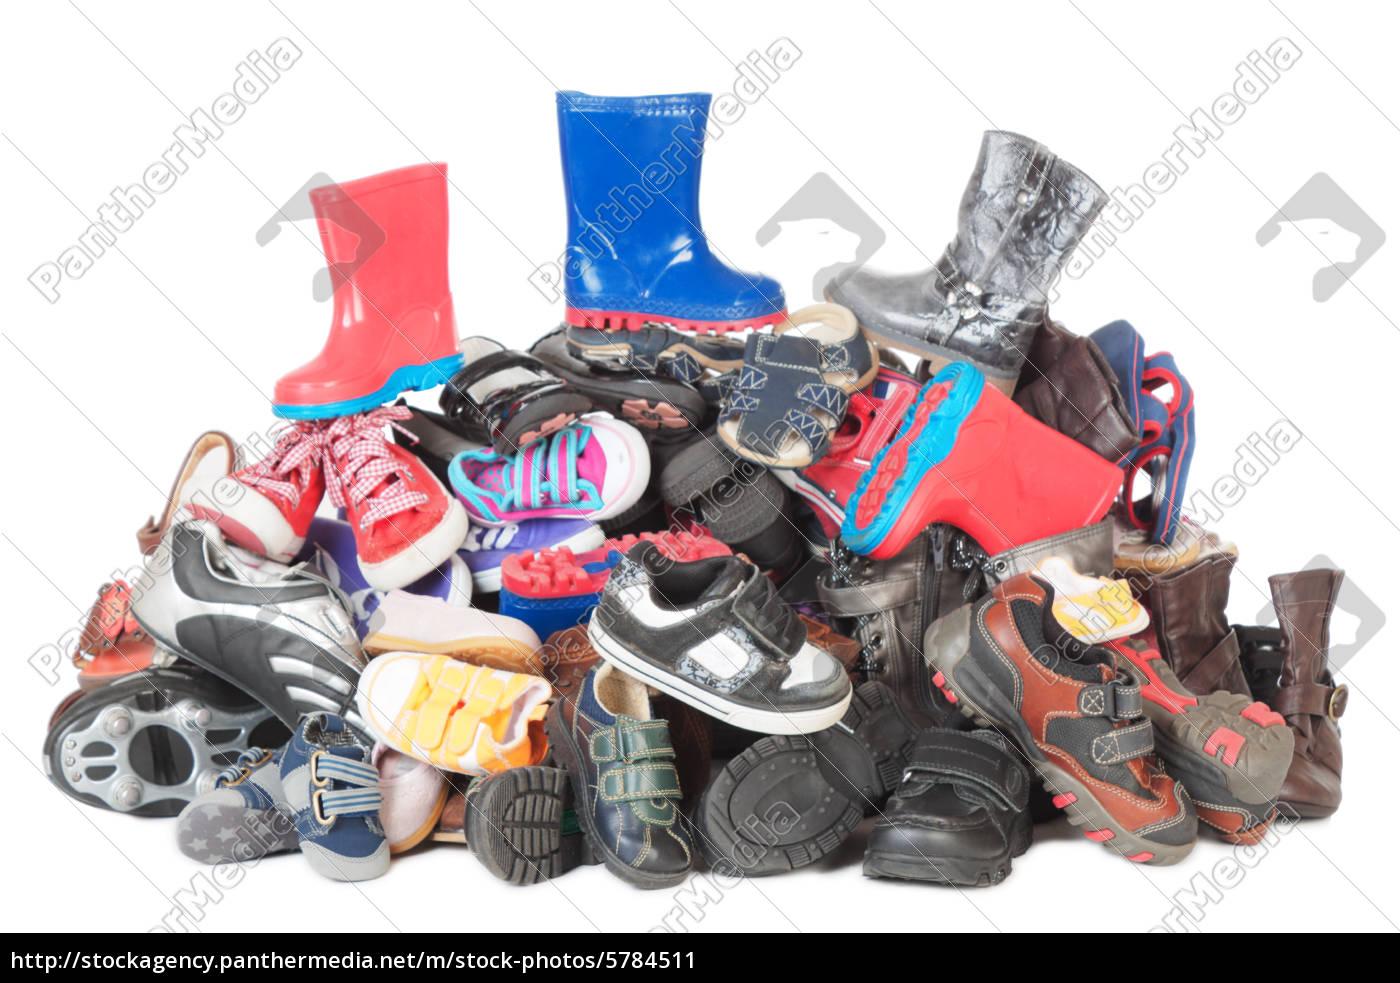 wholesale dealer fea1b 9fb89 Lizenzfreies Bild 5784511 - stapel von kinderschuhe isoliert mit schatten